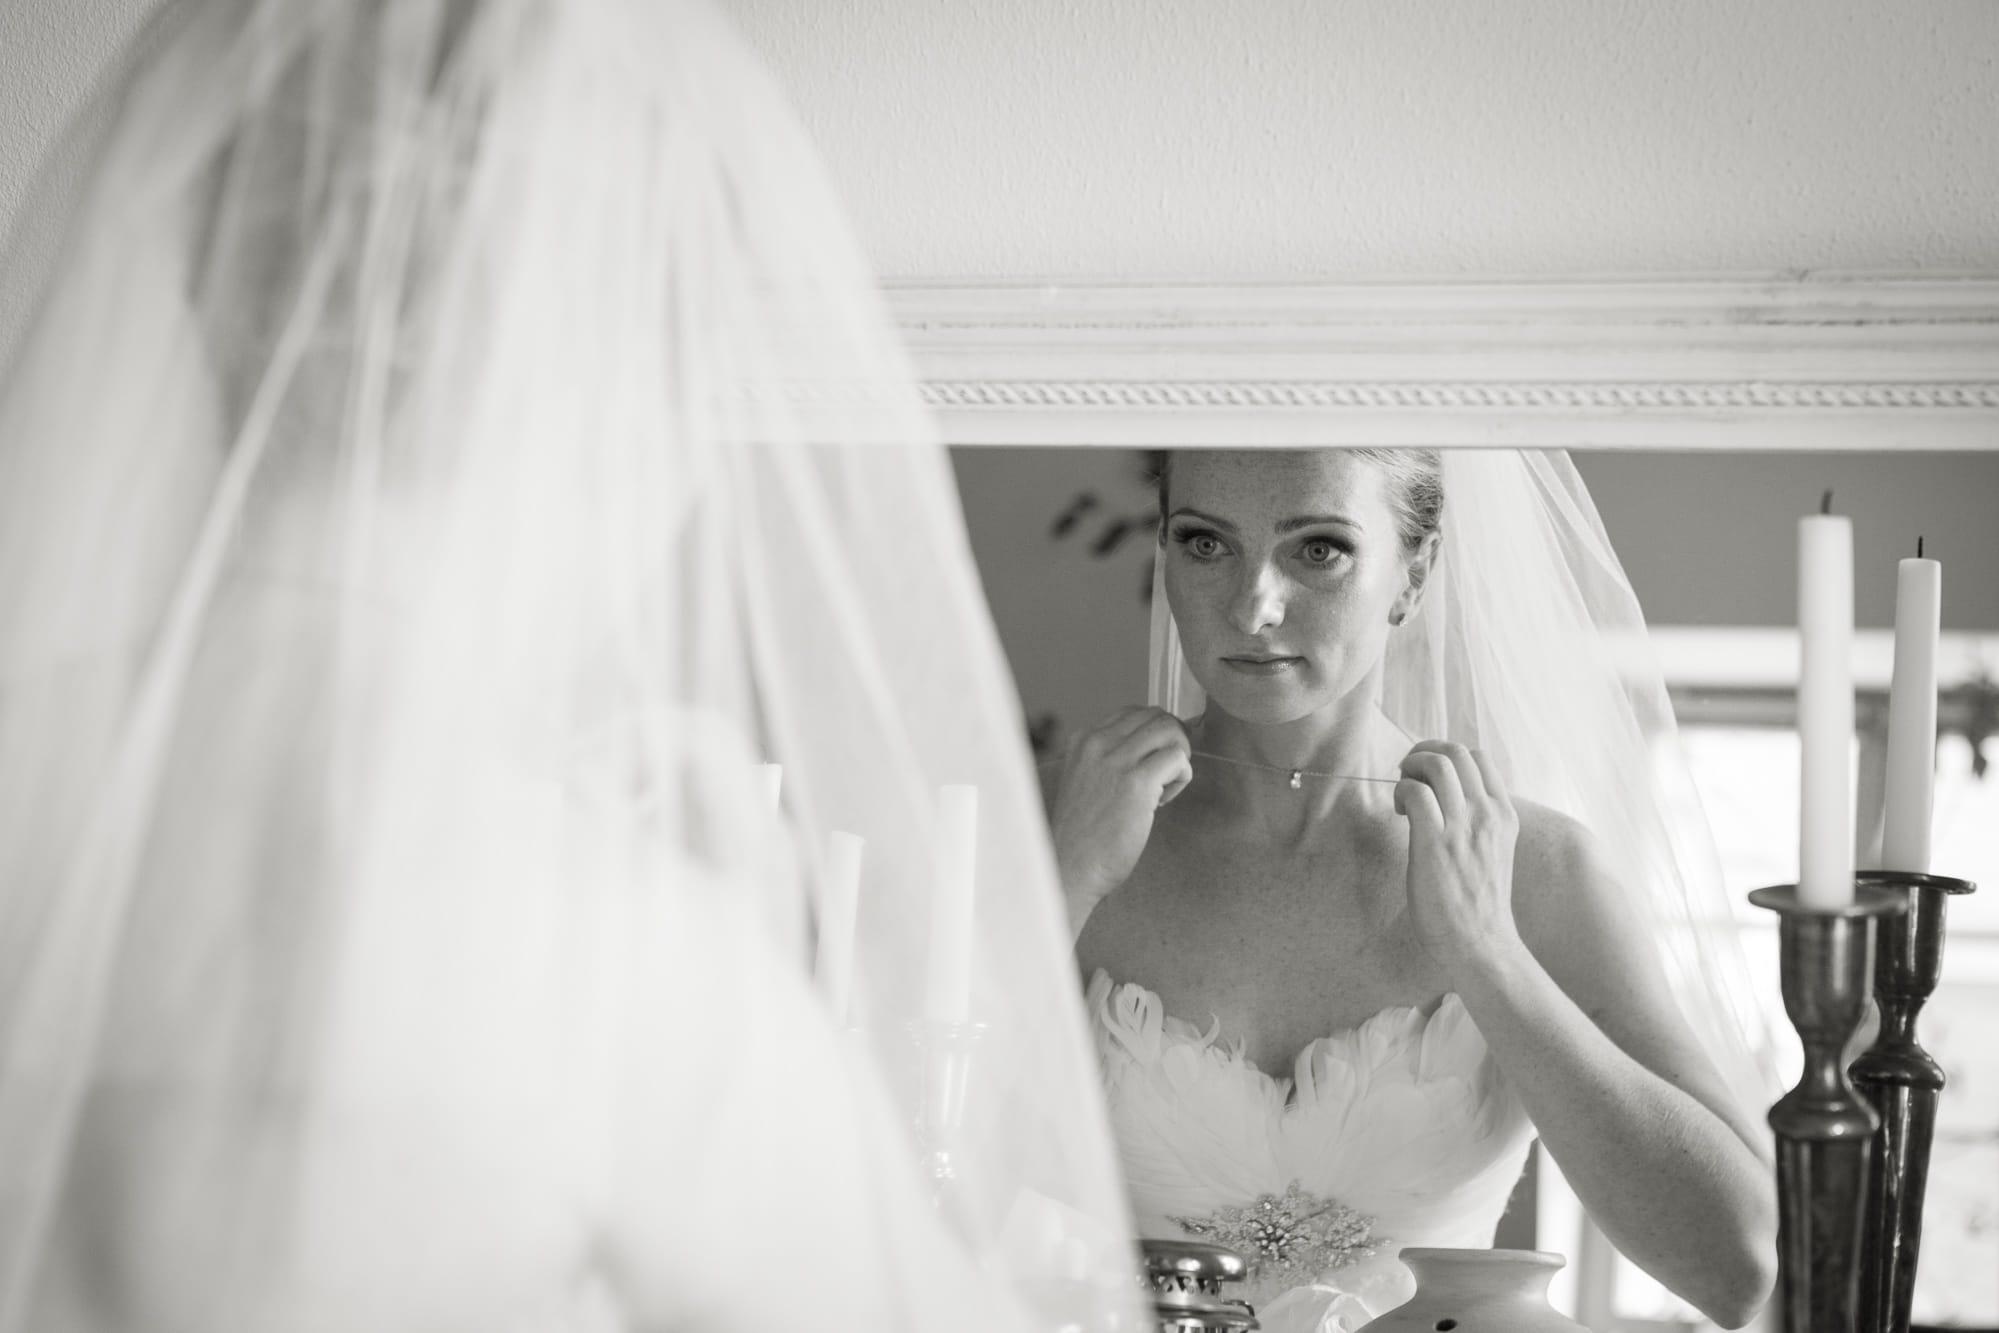 querformat-fotografie - Achim Katzberg - Hochzeiten - Getting ready - querformat-fotografie_Hochzeiten_Getting_Ready-010